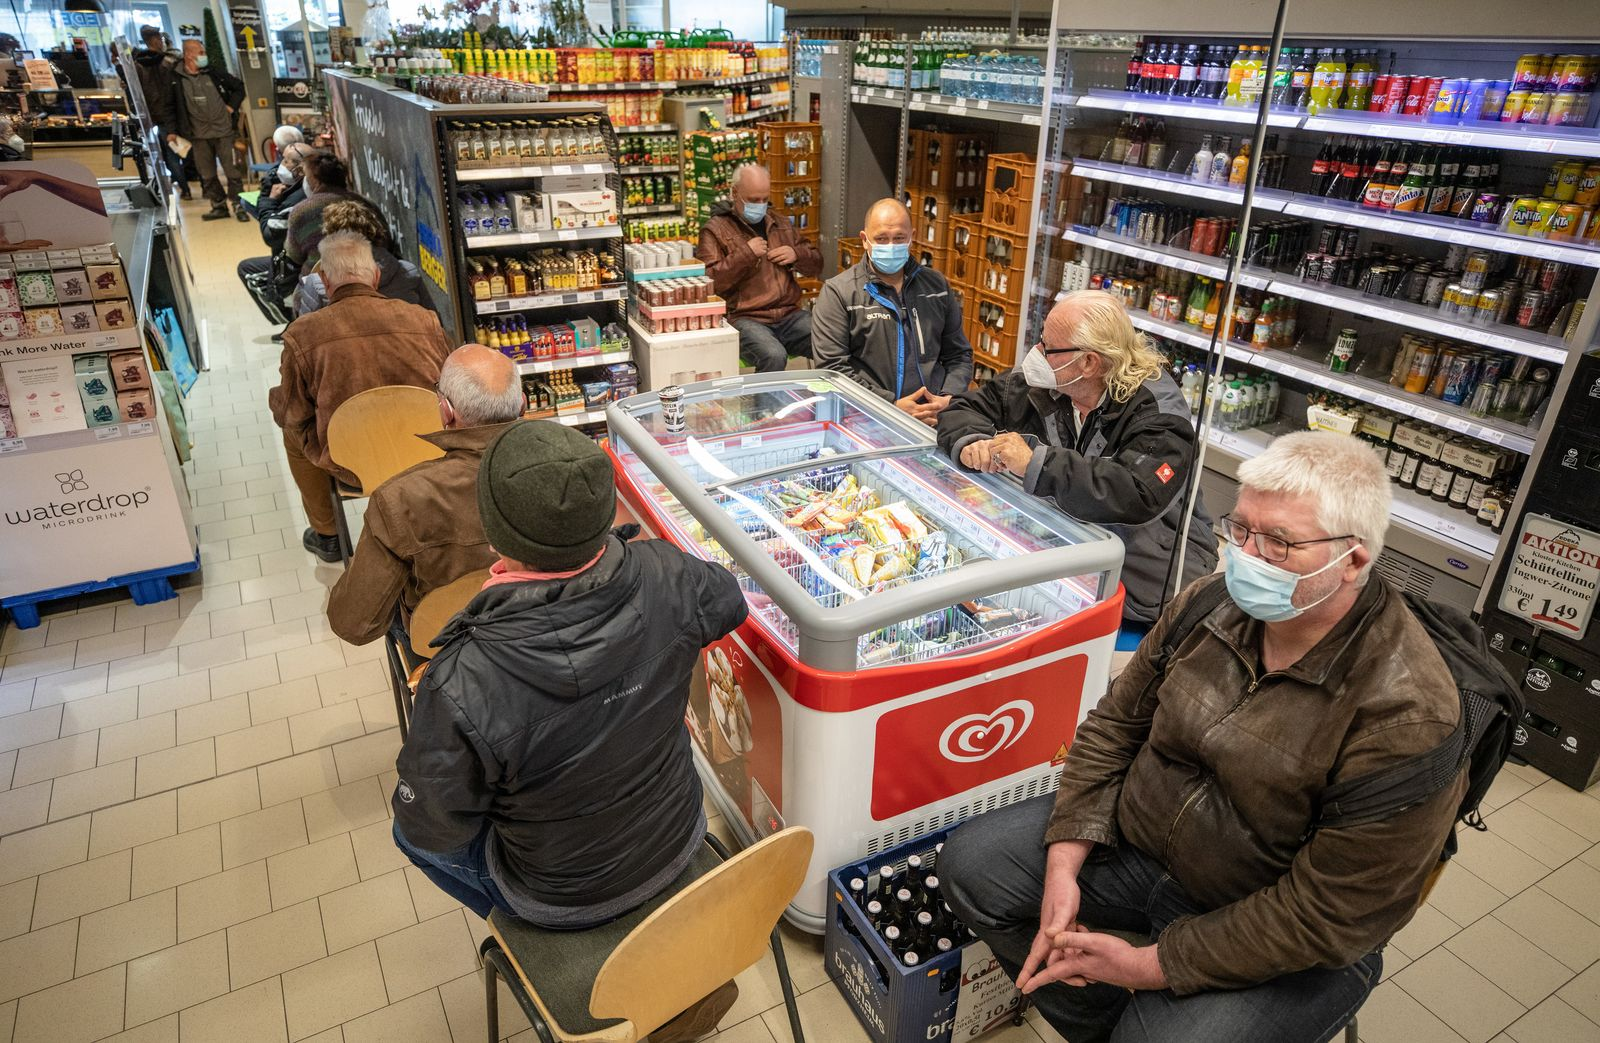 Coronavirus - Impfaktion in Supermarkt